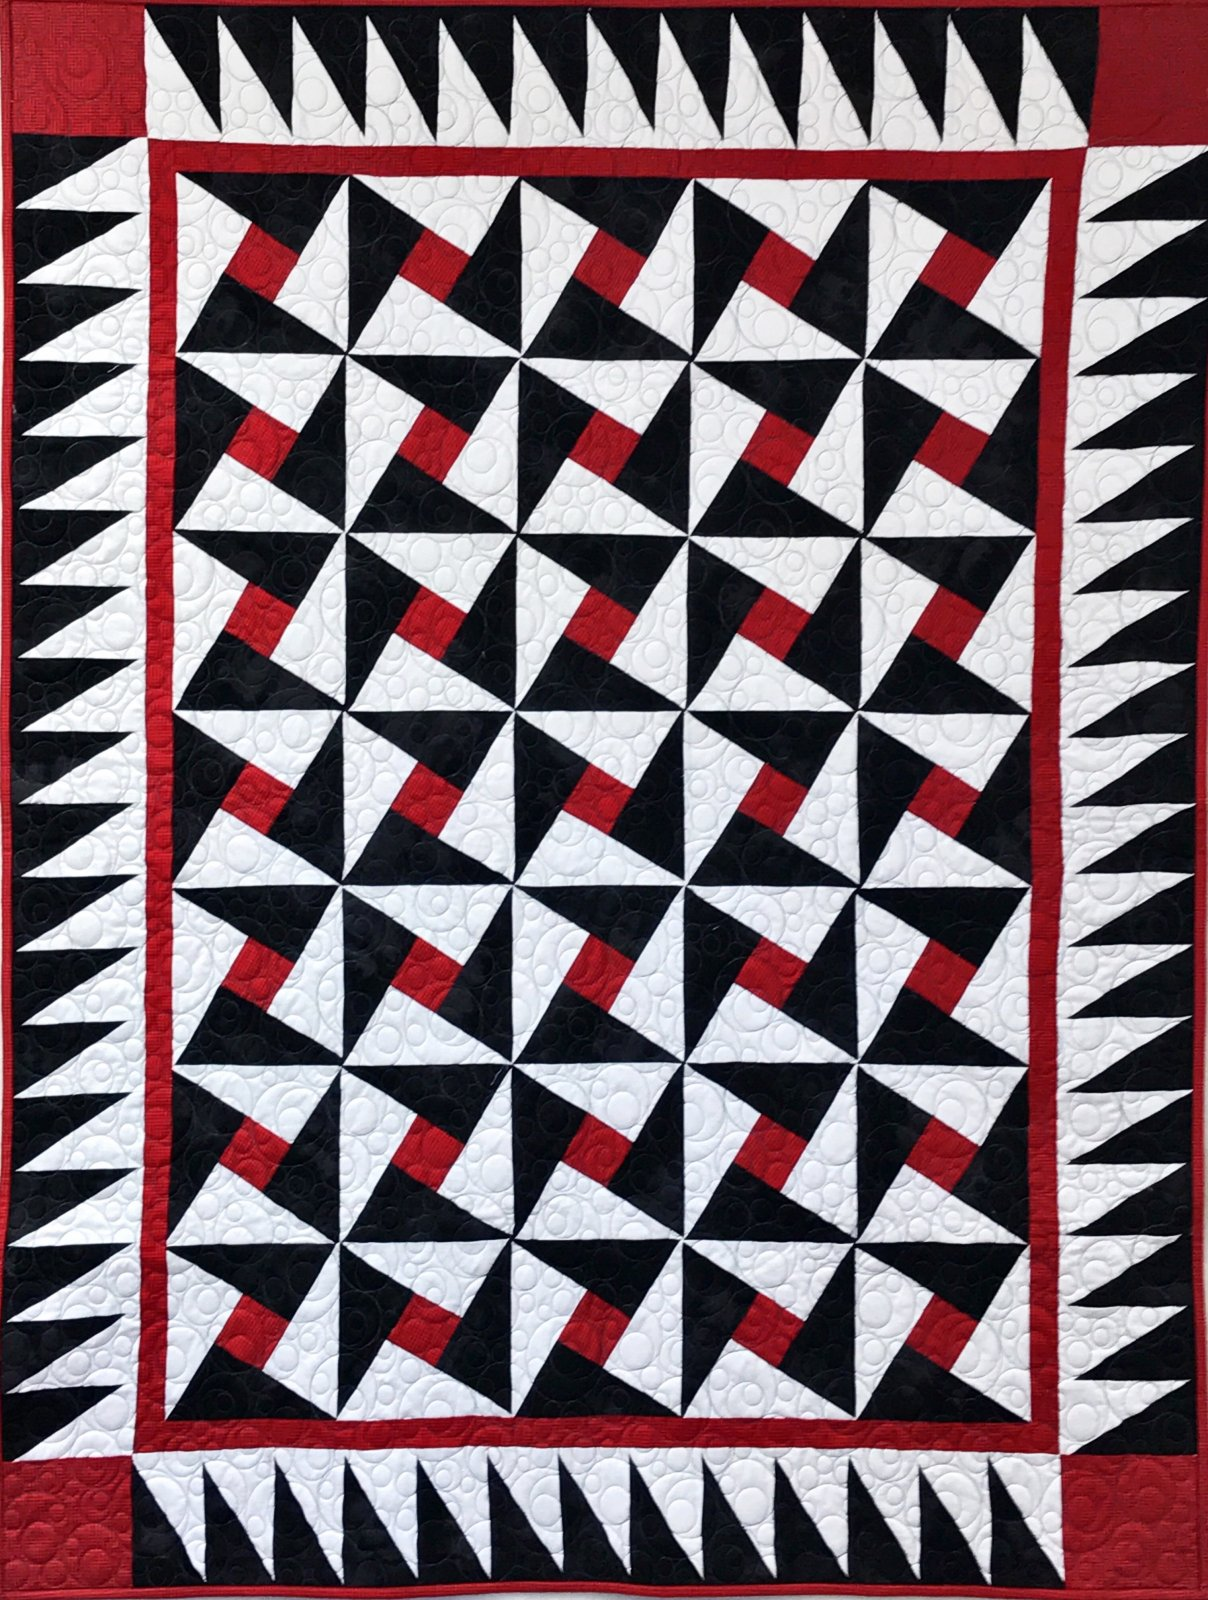 Tuxedo X-Block Pattern